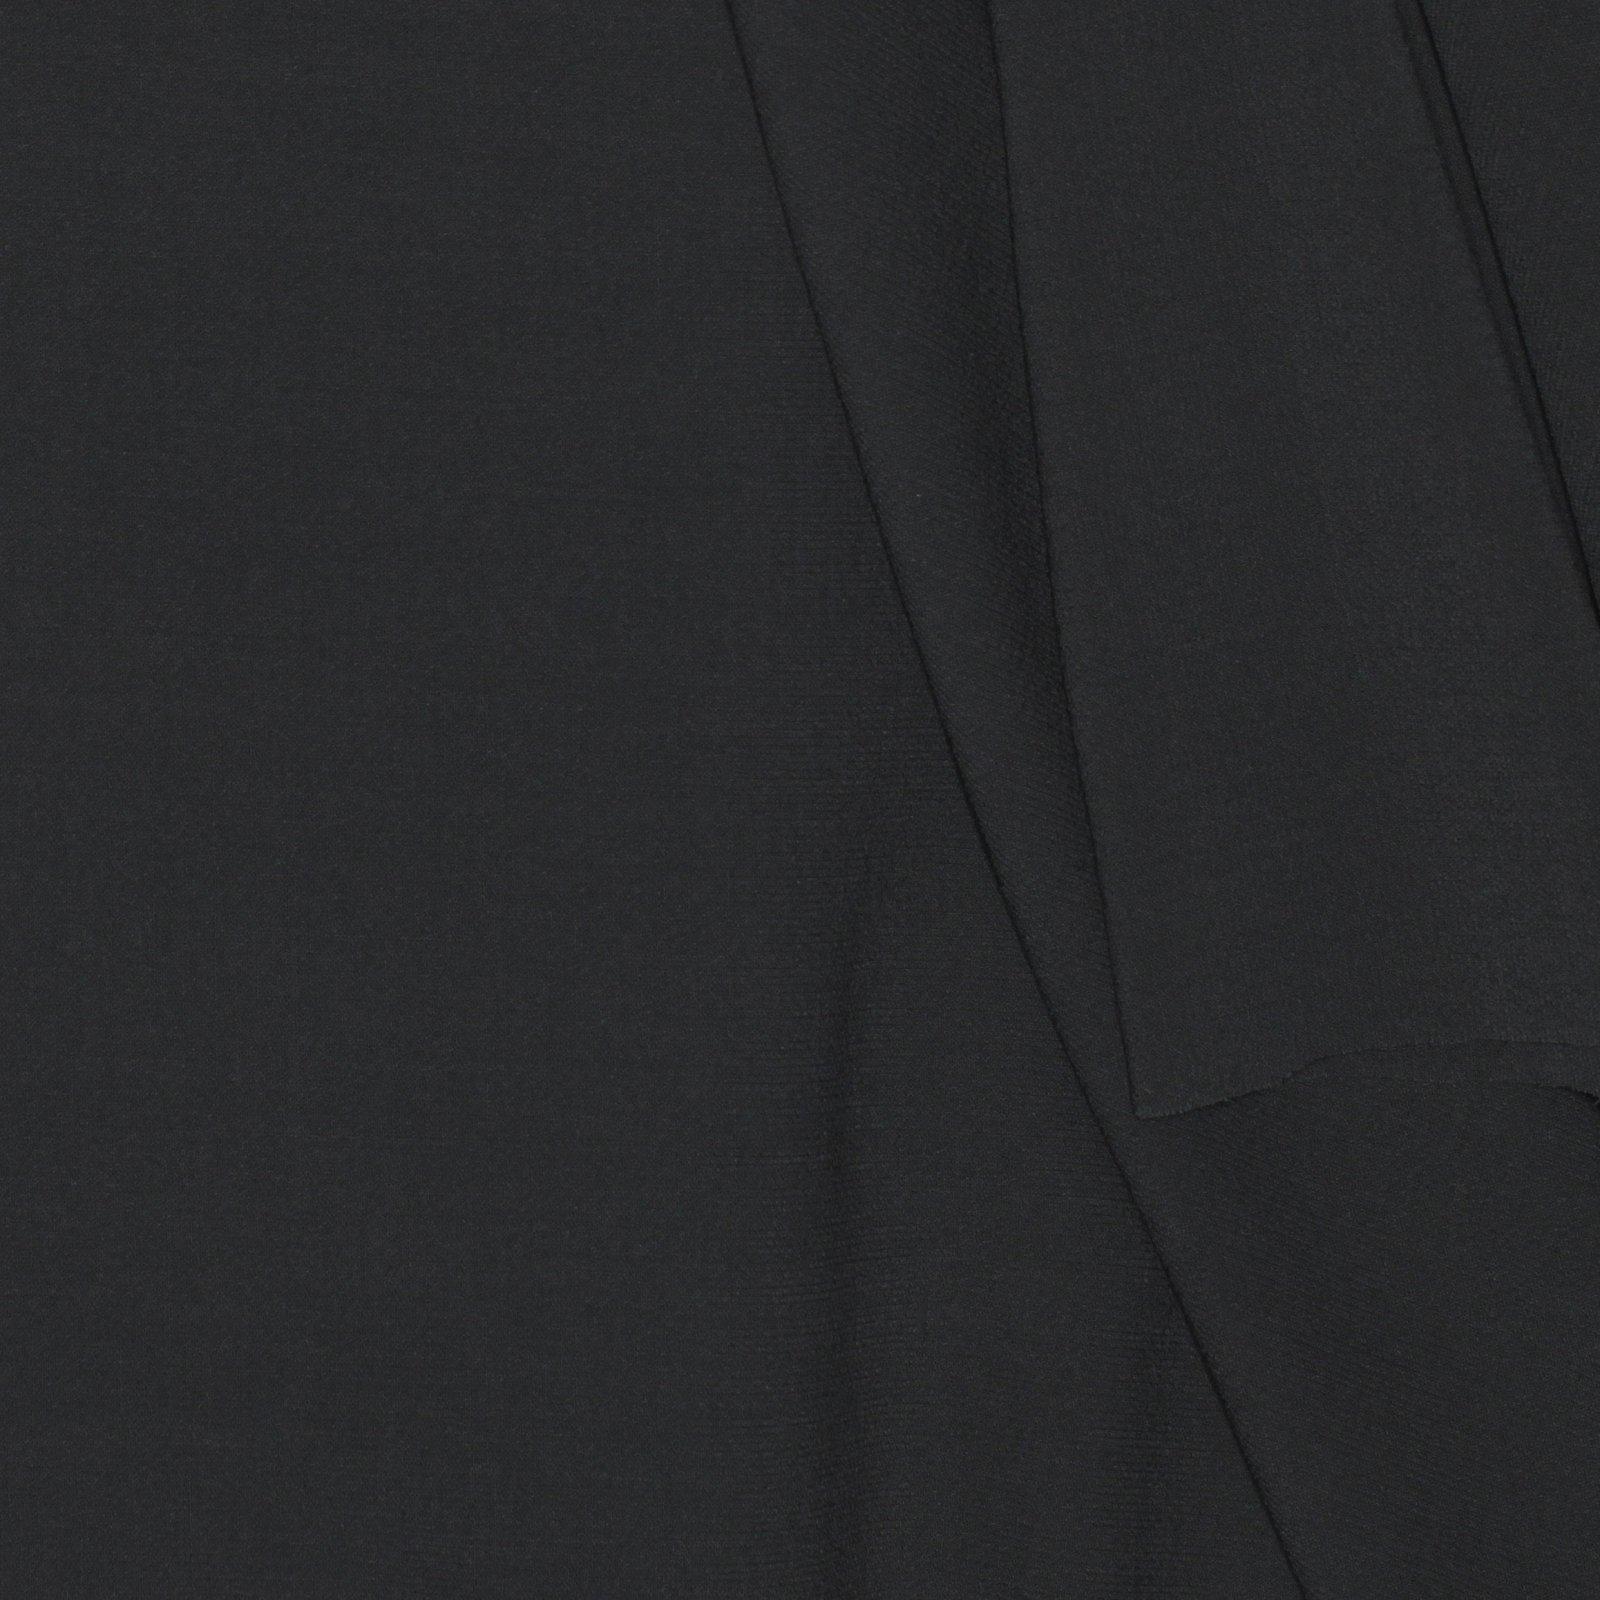 Solid Slate Grey Italian Wool/Lyrca Textured Crepe